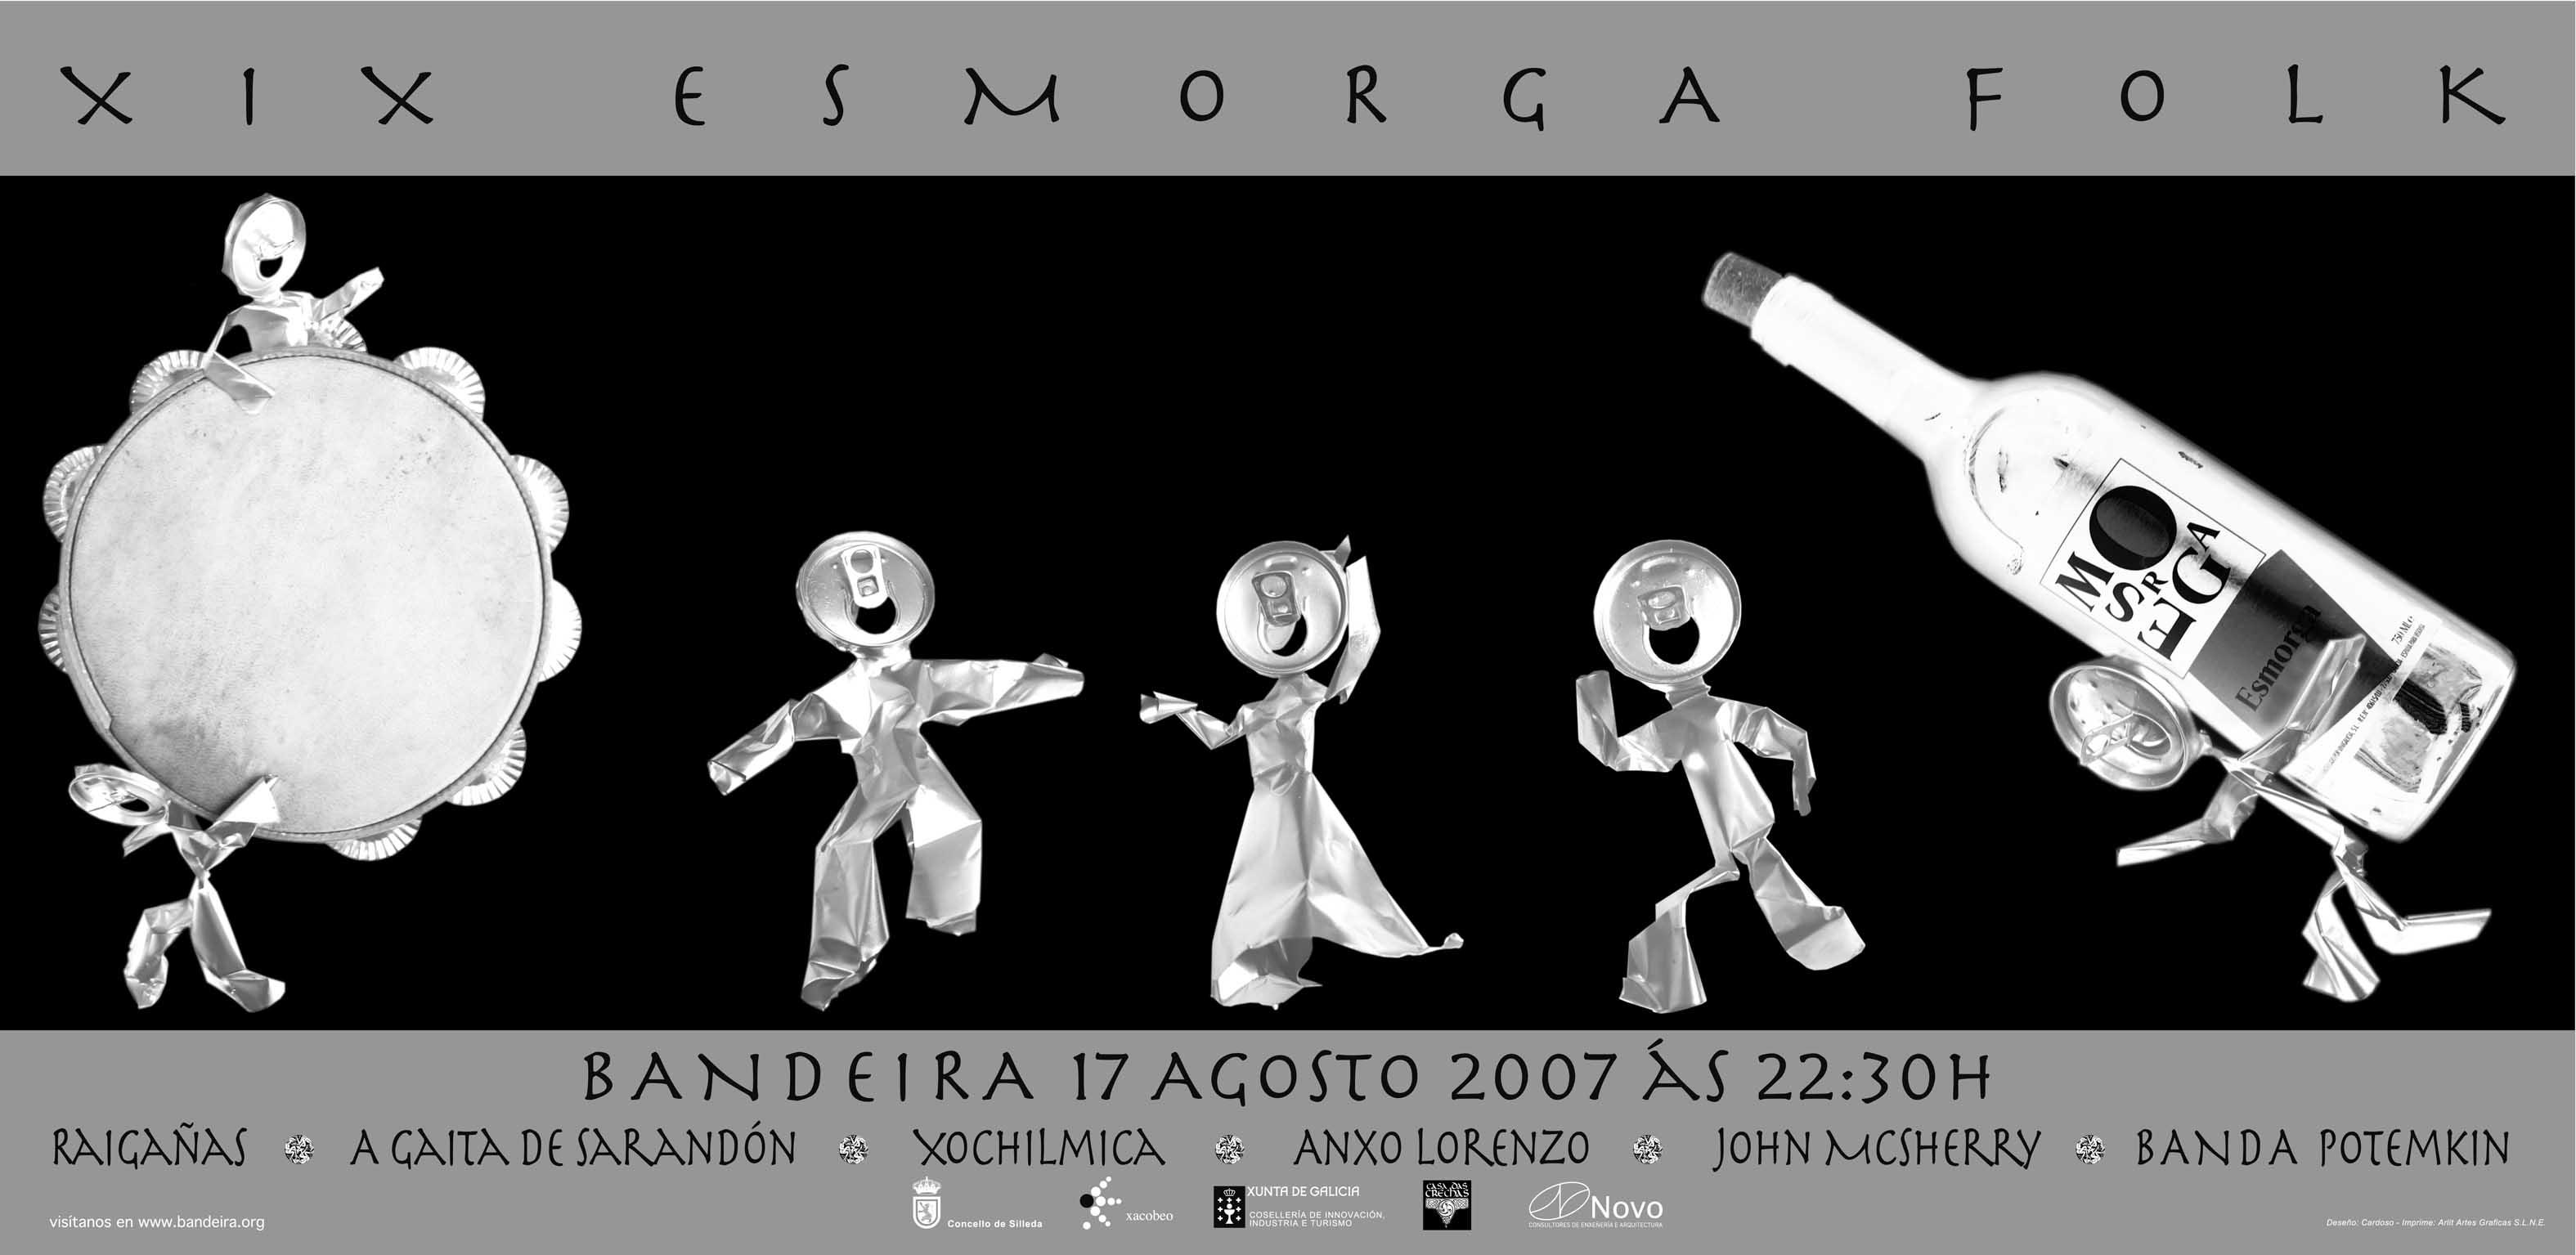 CARTEL ESMORGA FOLK 17-08-07 BANDEIRA.jpg